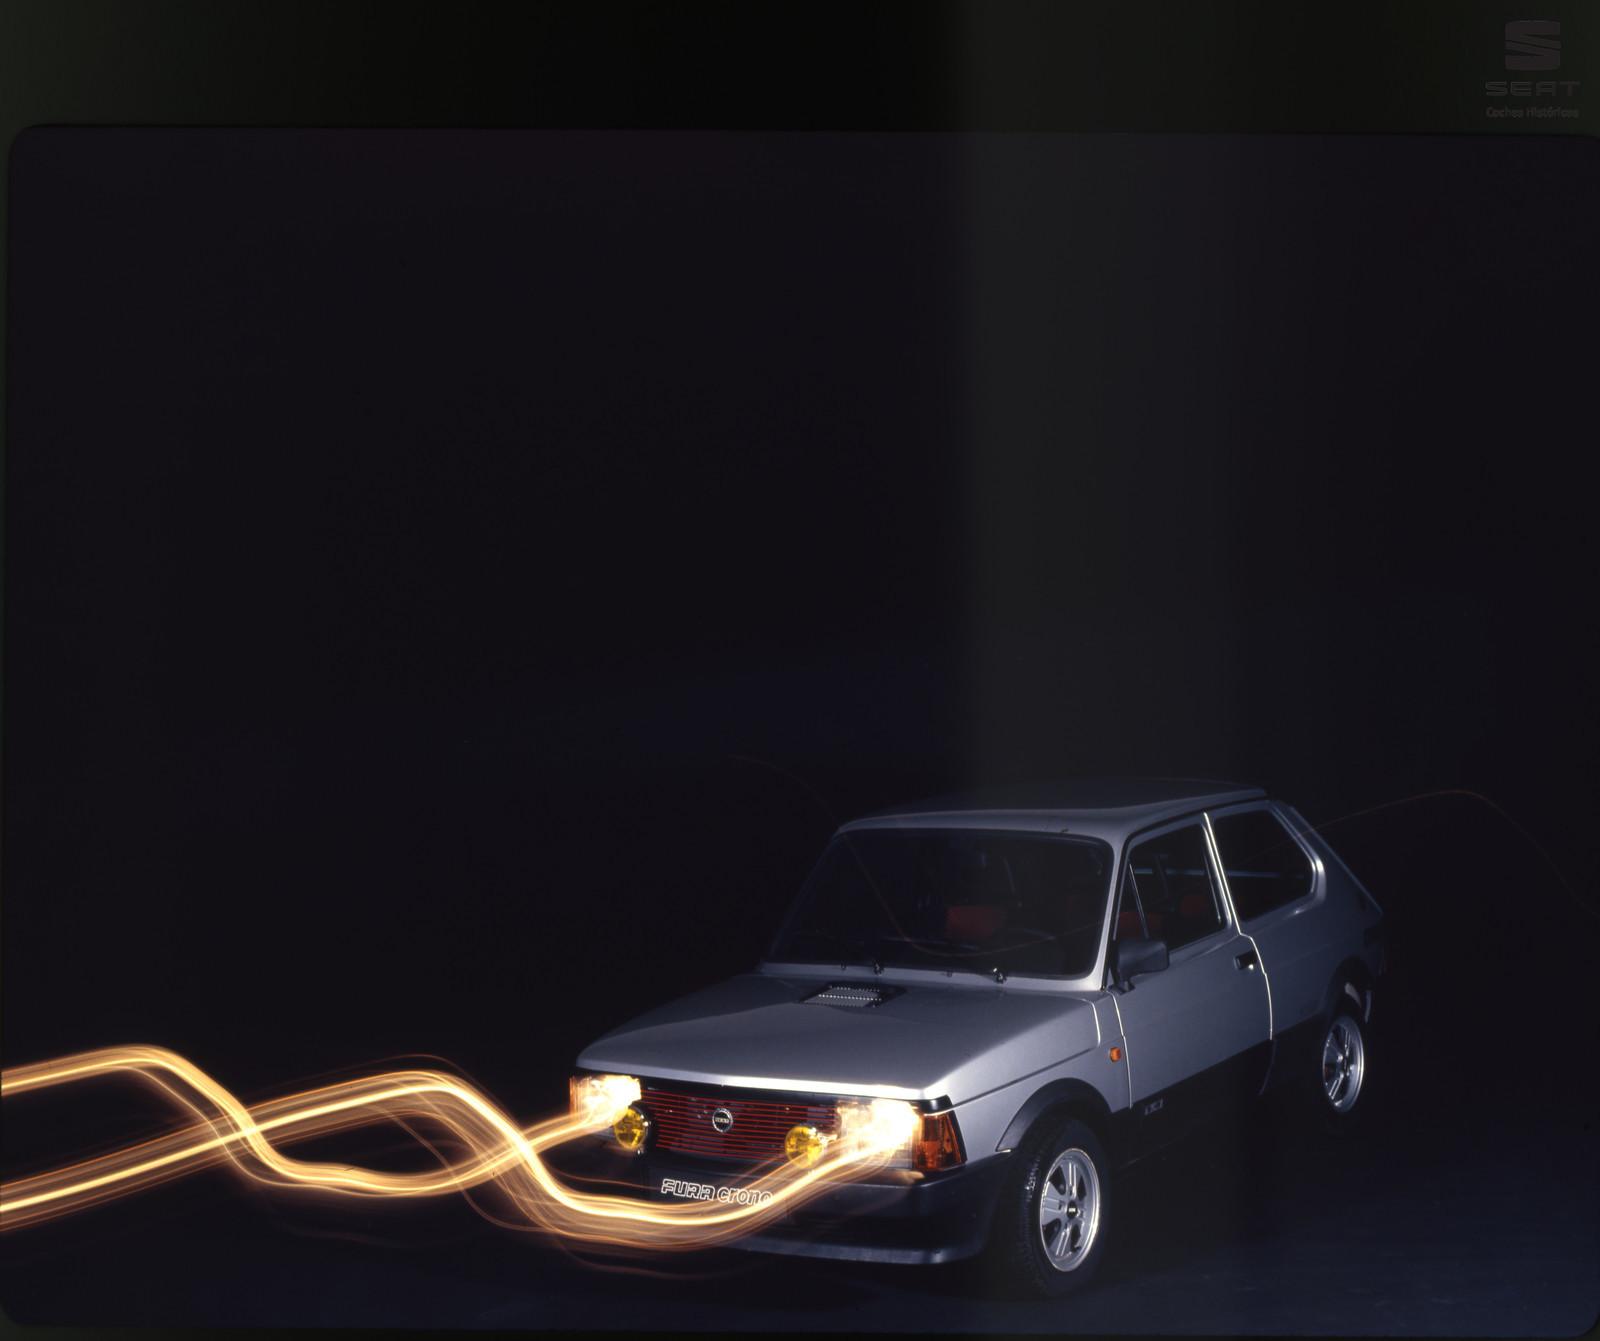 Foto de Motor SEAT 1430 - fotos históricas (45/49)